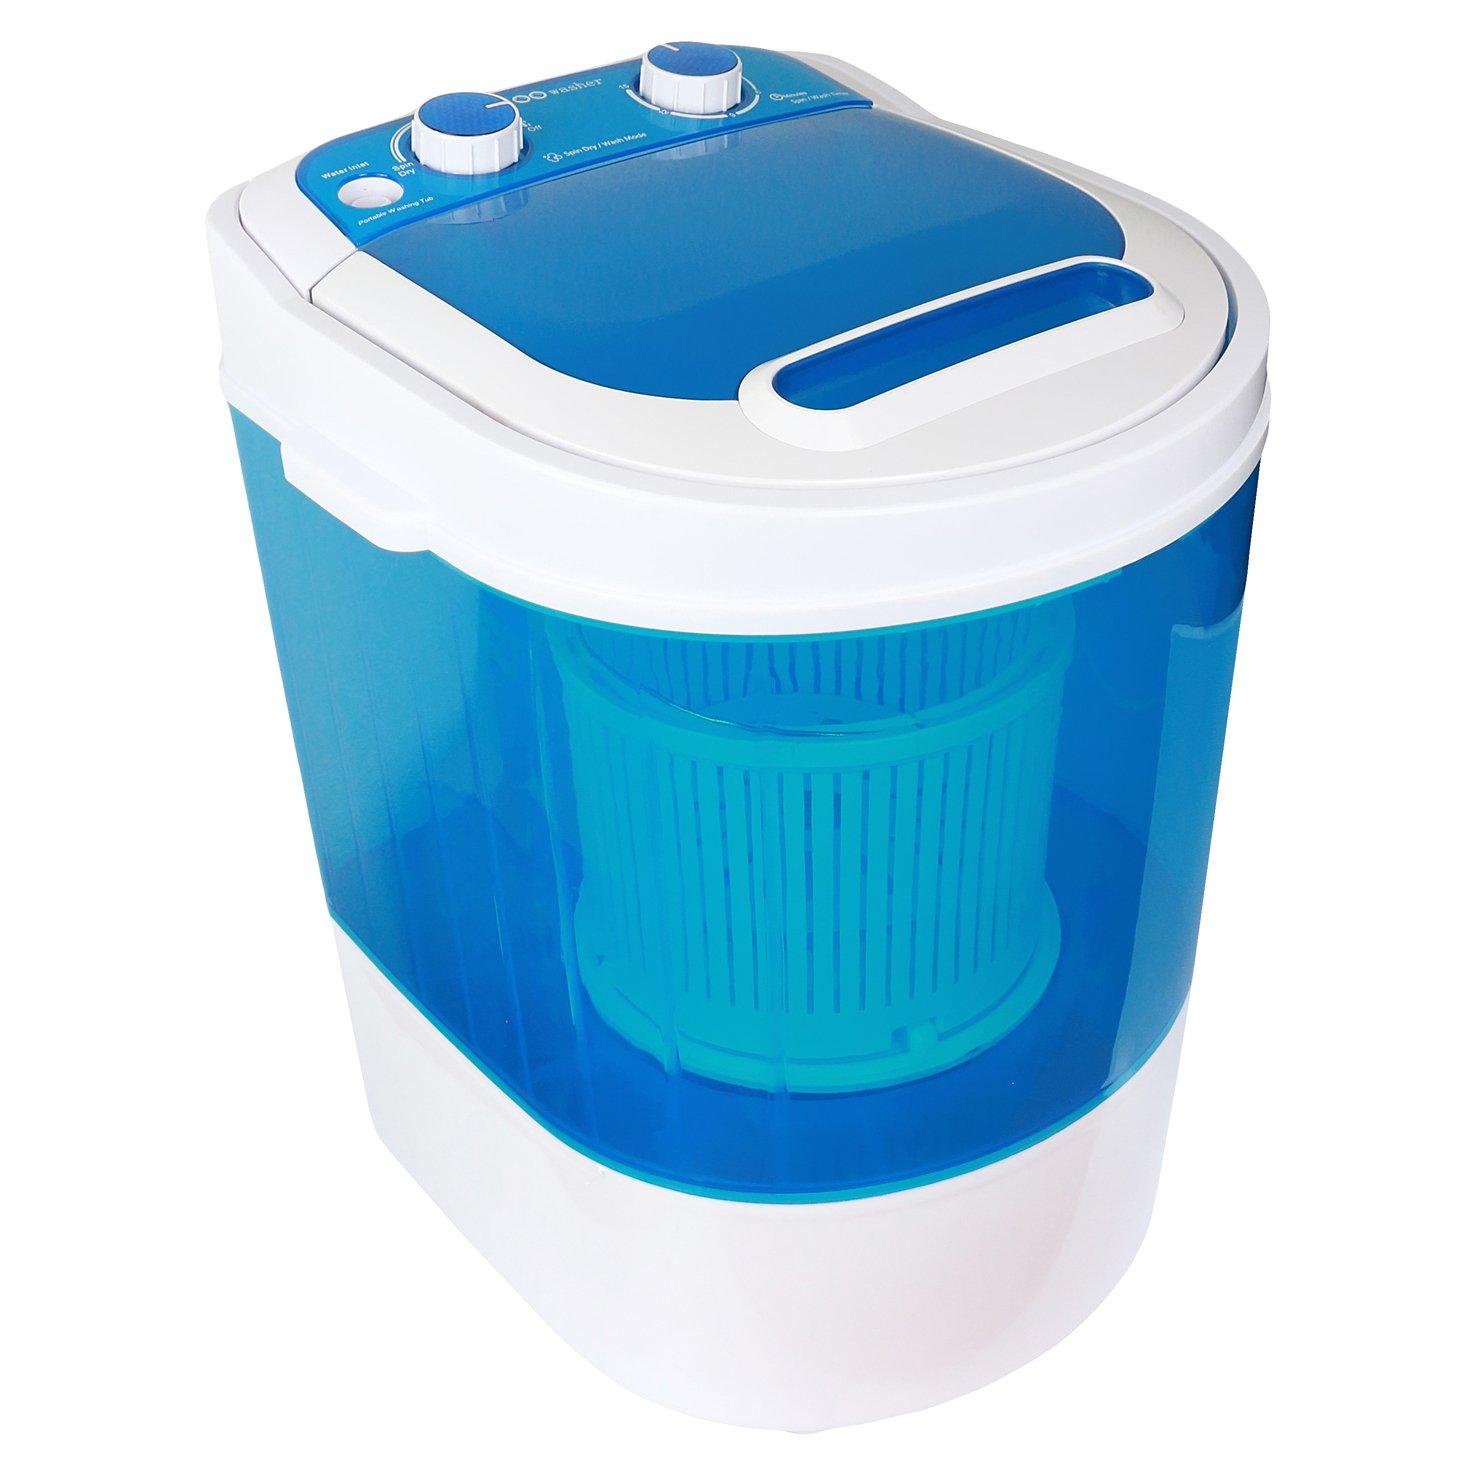 Clothes Inwashing Machine ~ Woowasher mini portable washing machine spin dry lbs